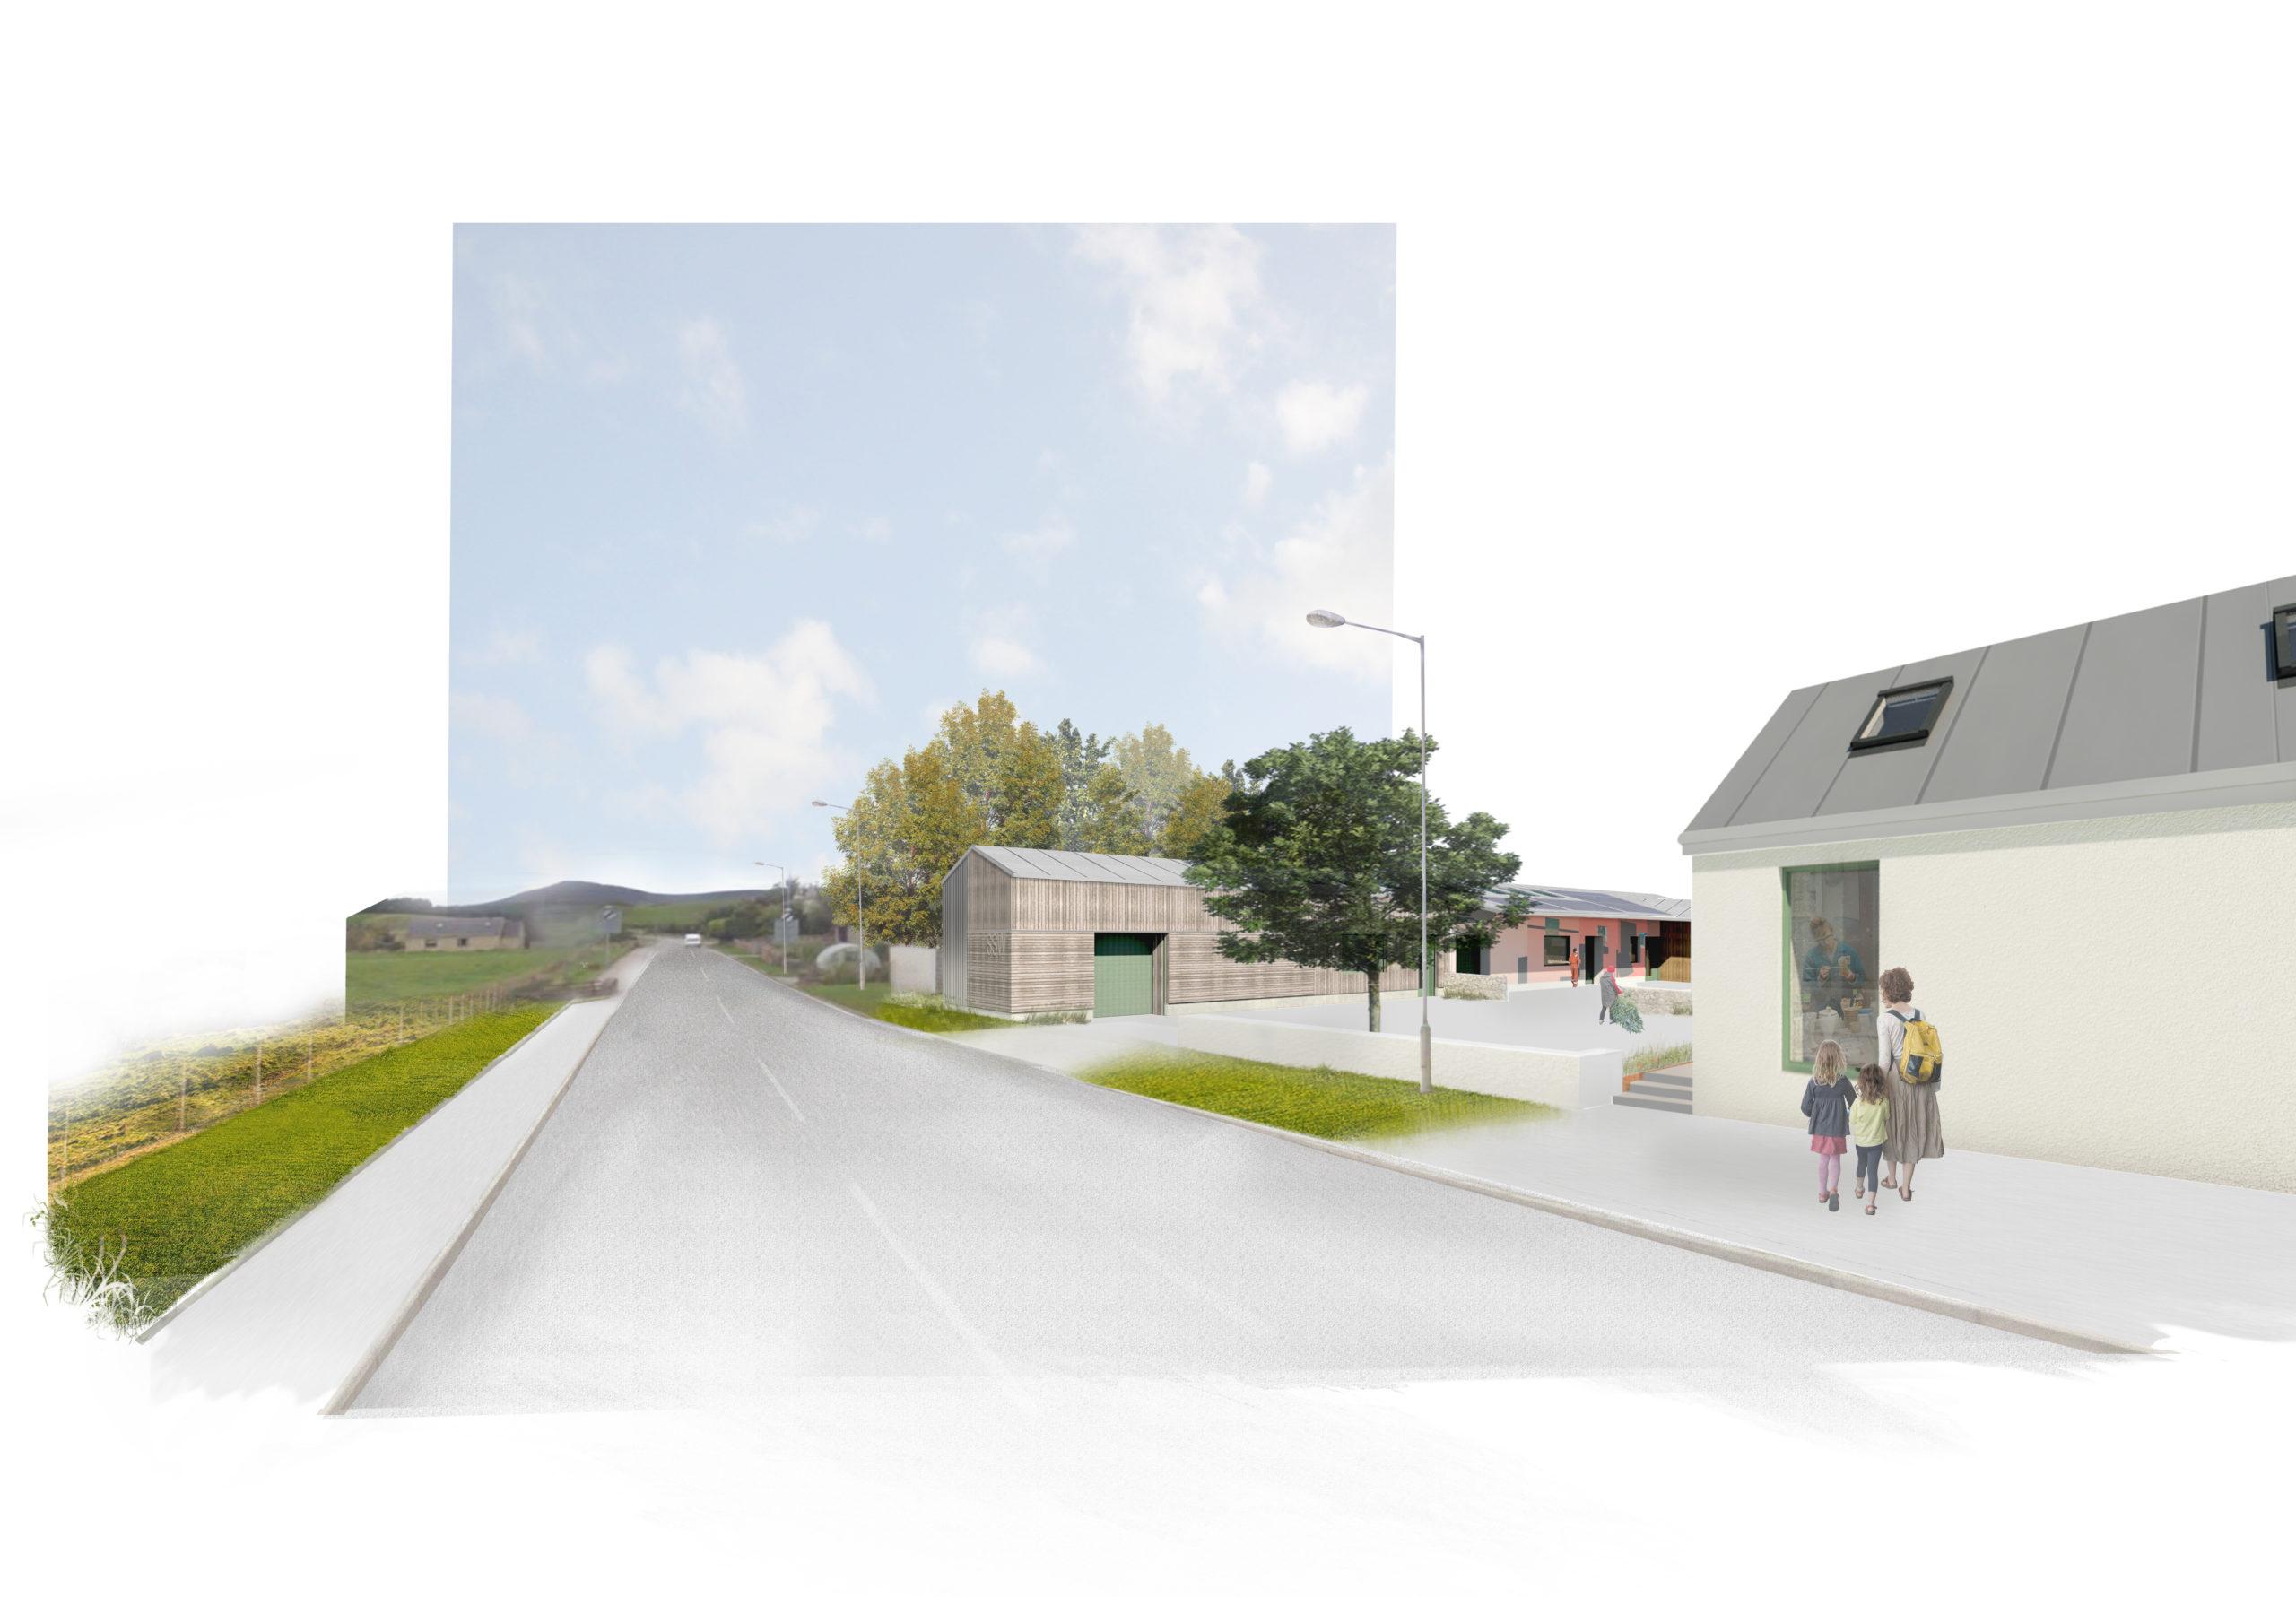 An artist's impression of the proposed Scottish Sculpture Workshop redevelopment